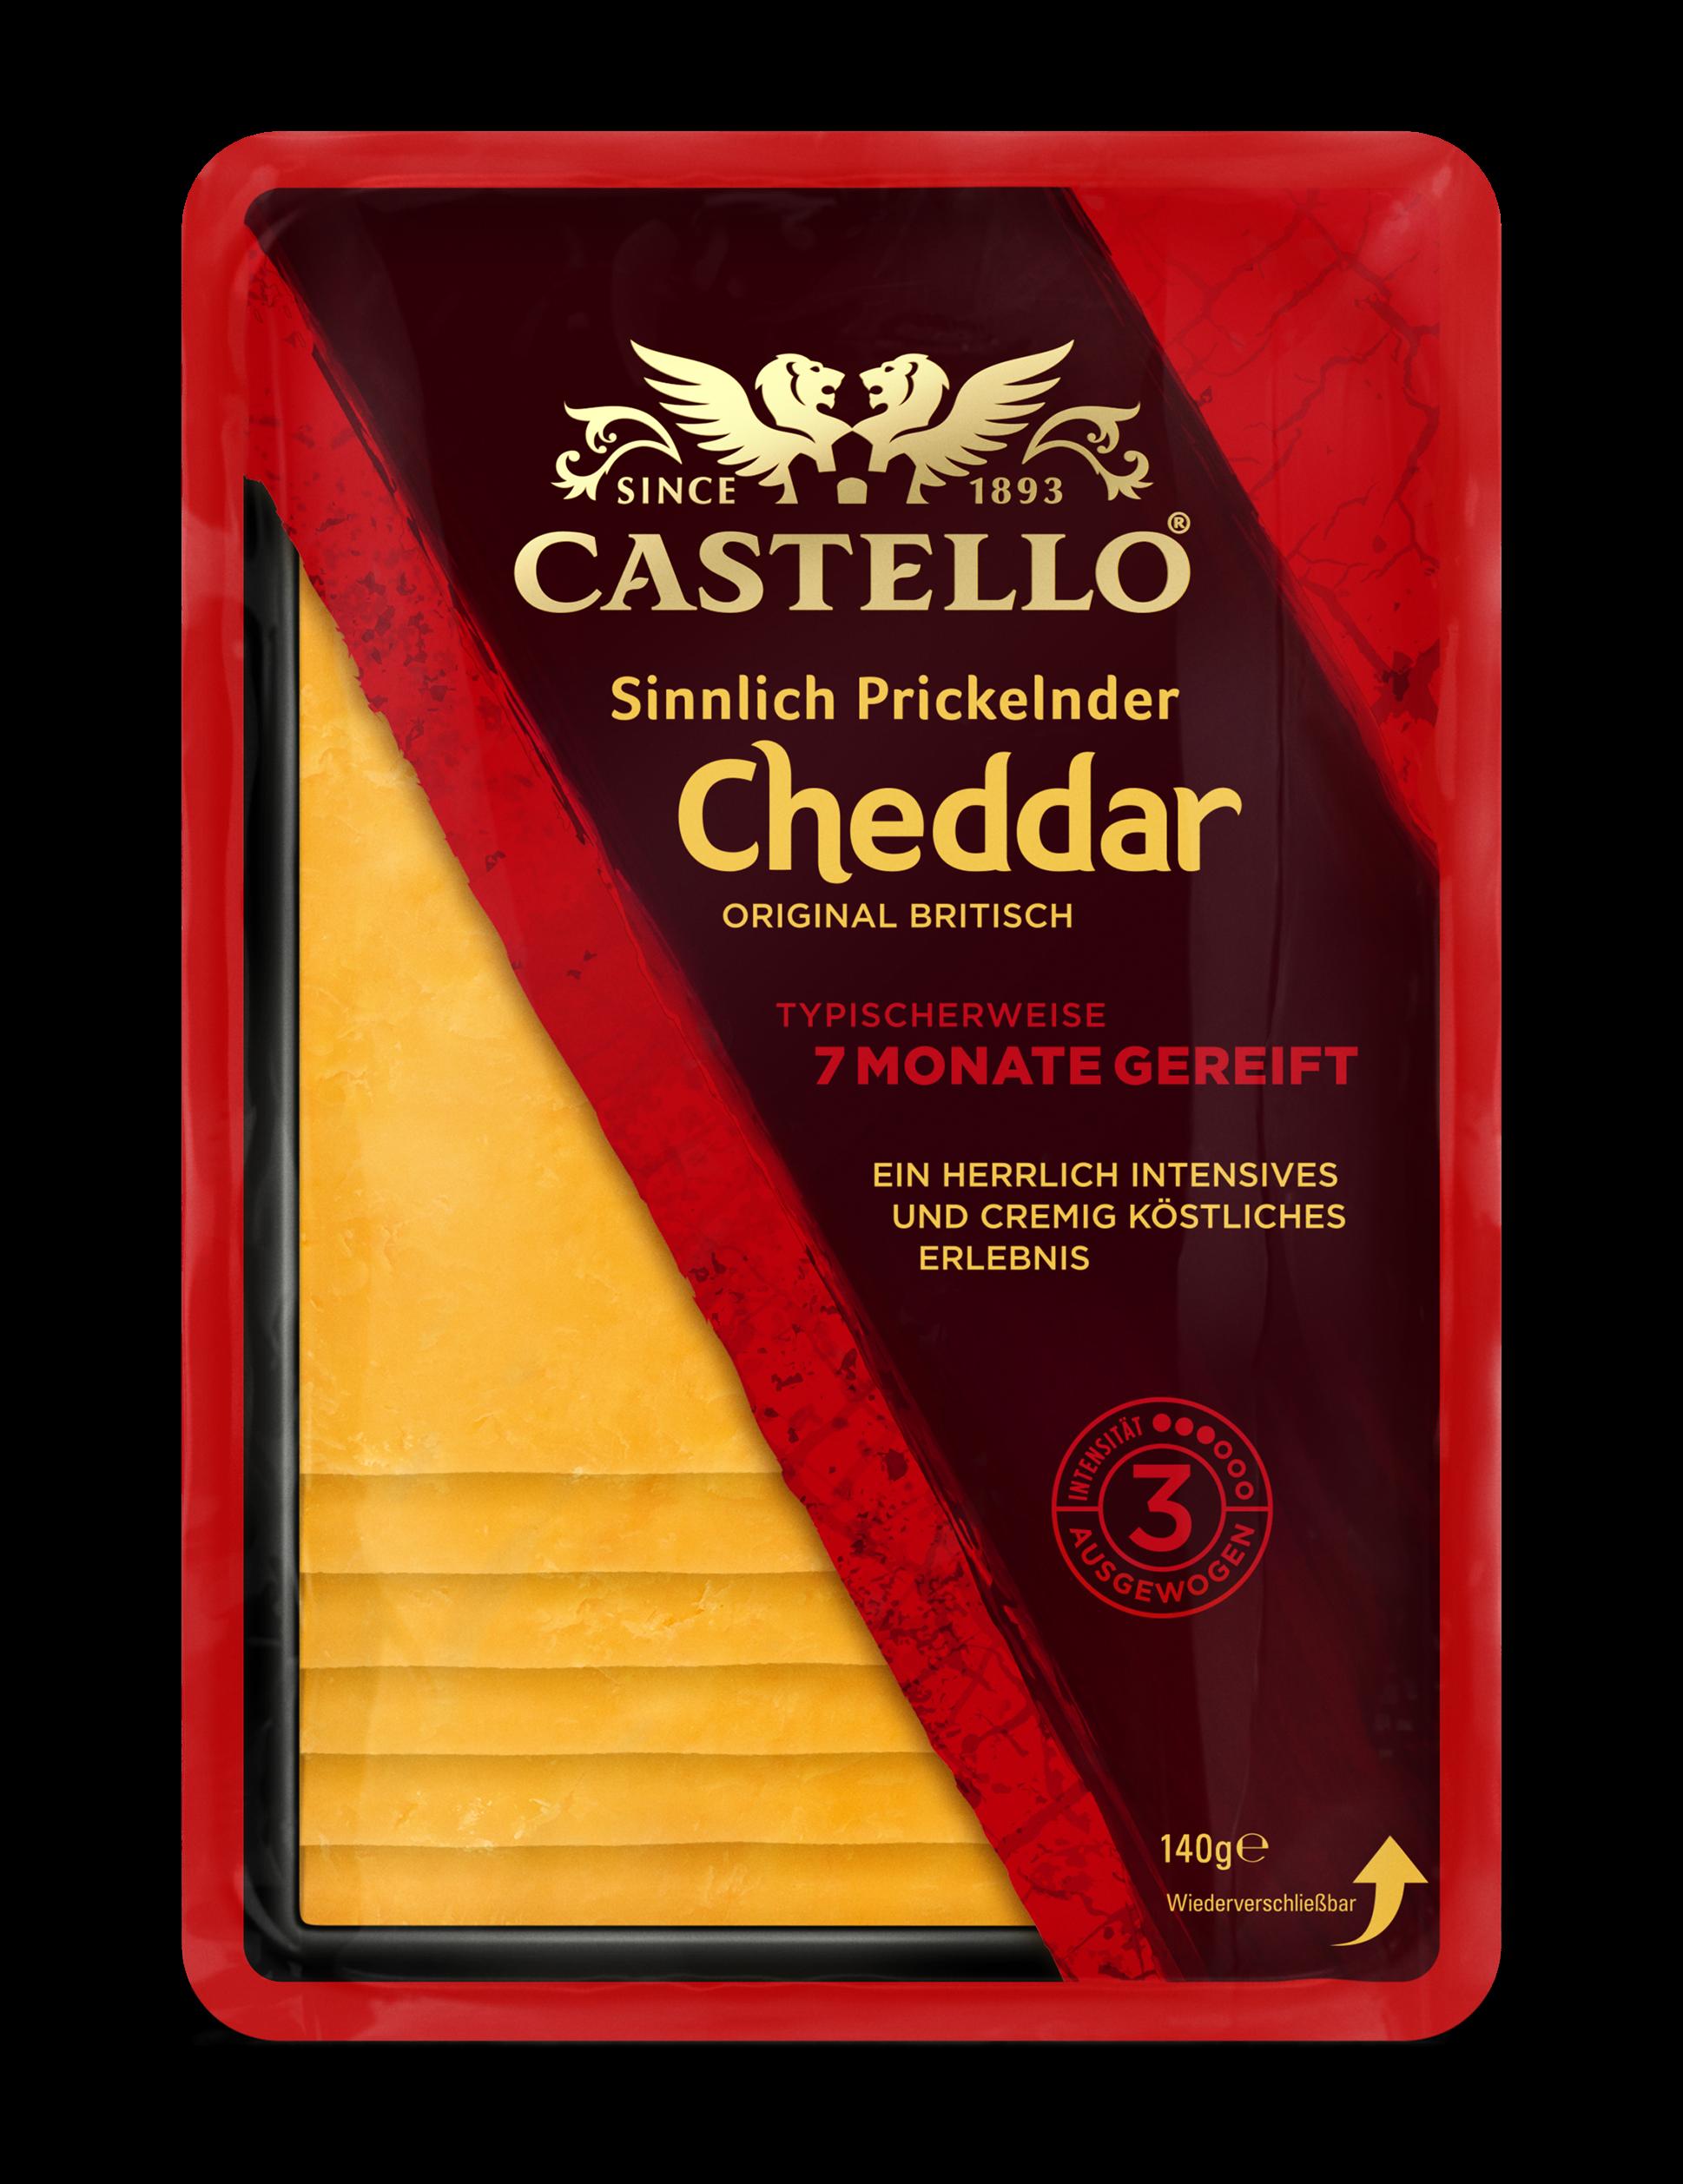 Castello® Cheddar 7 Monate Gereift